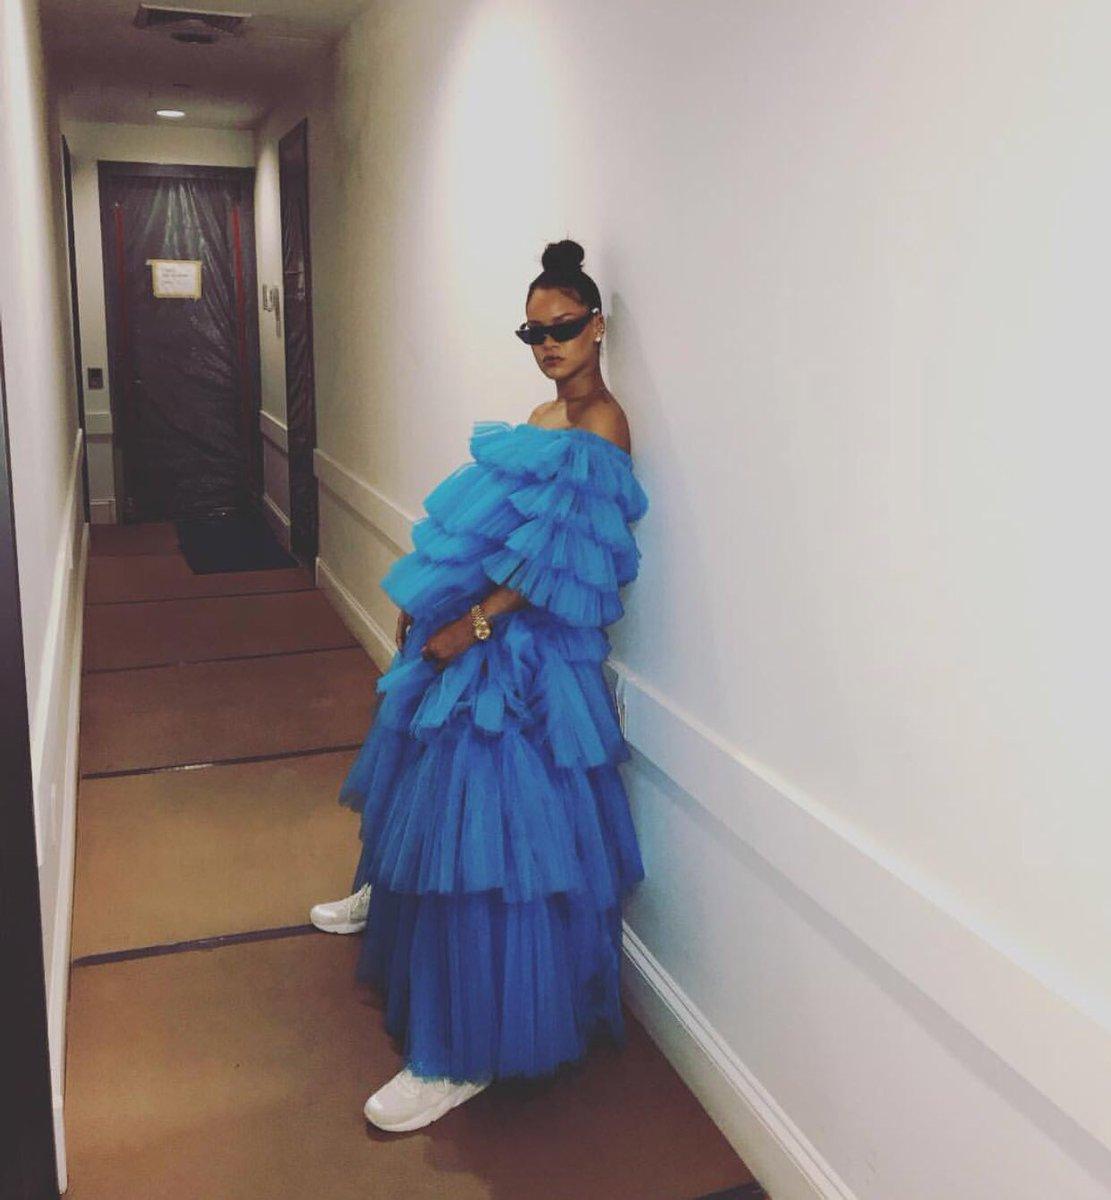 Rihanna wearing Molly Goddard via Instagram @badgalriri